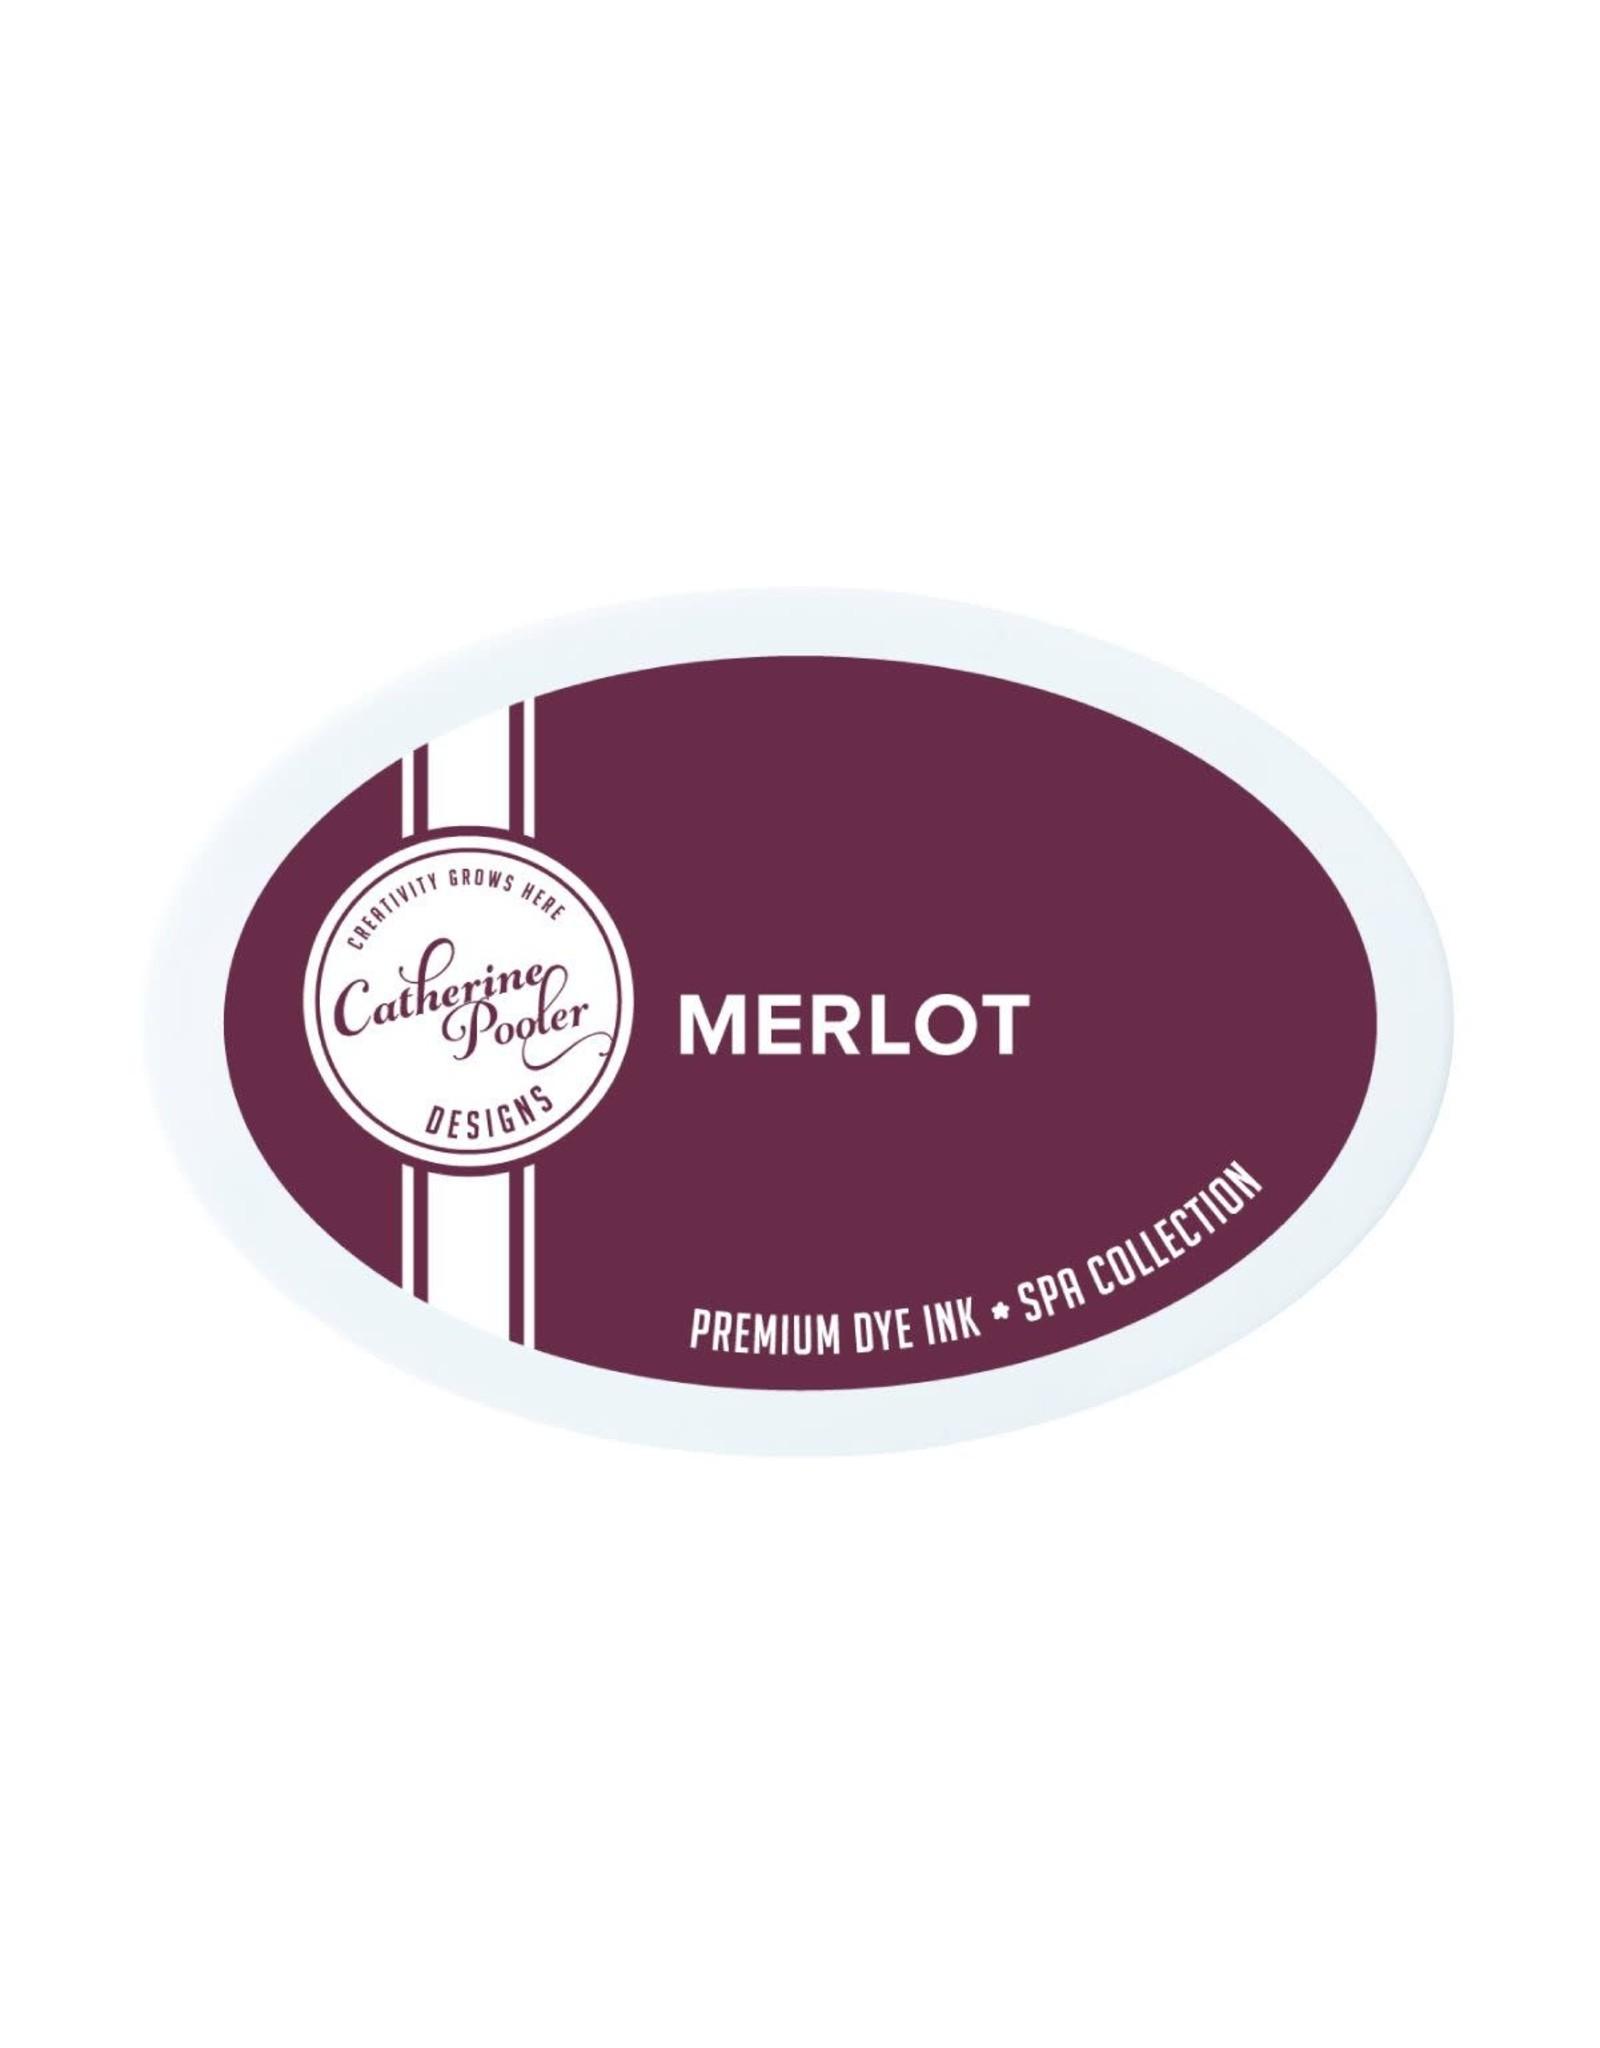 Catherine Pooler Designs Merlot Ink Pad